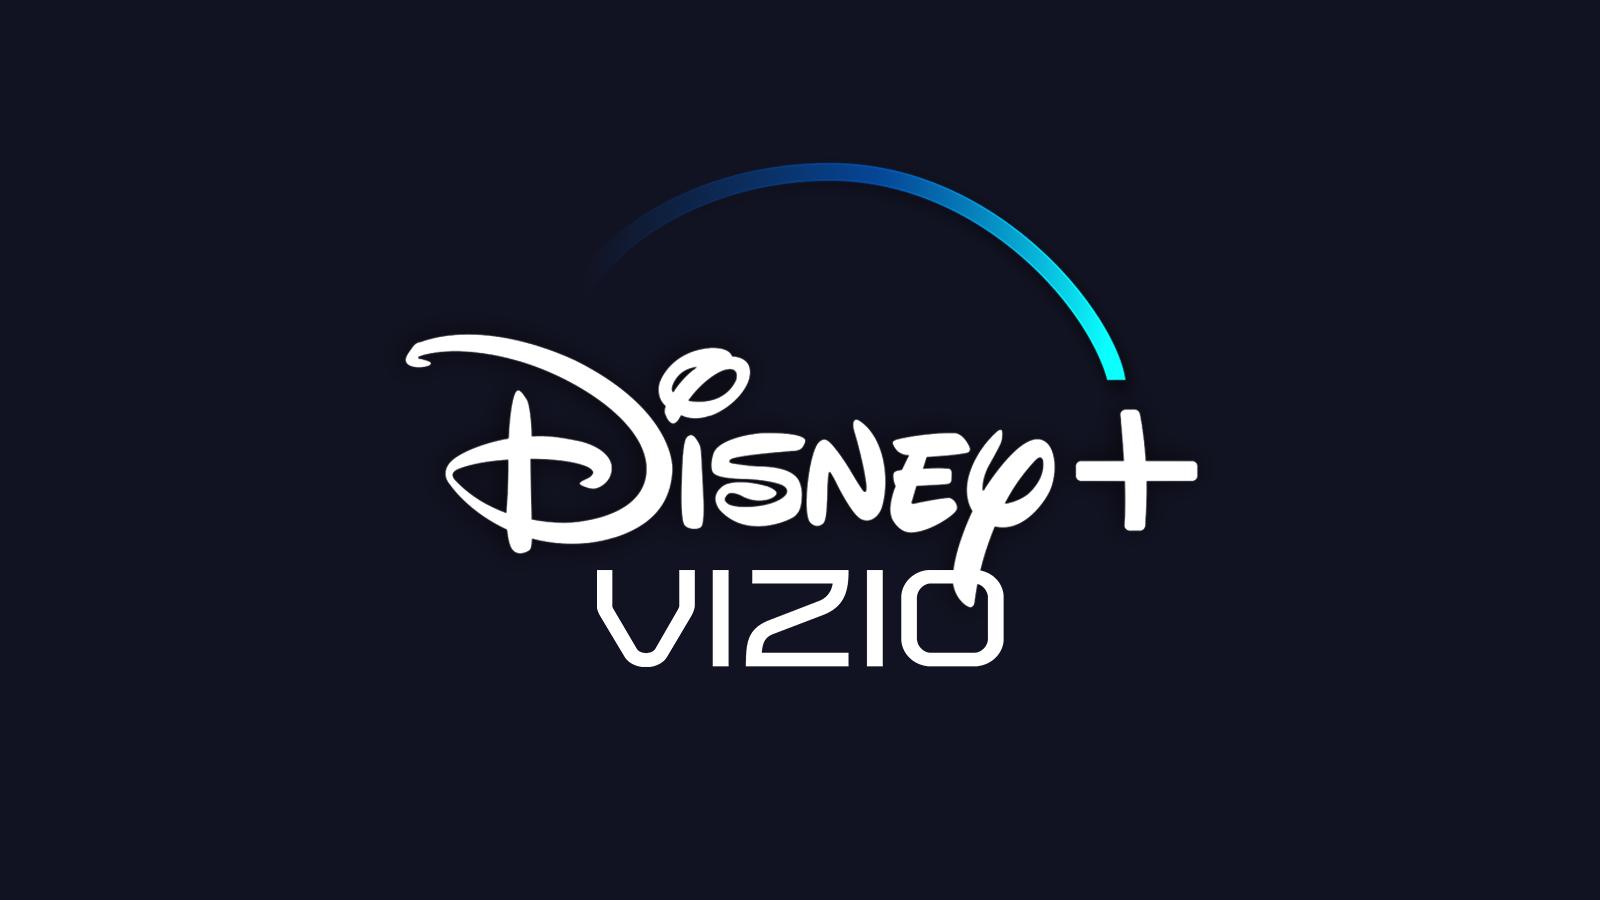 How To Get Disney Plus On My Smart Tv Vizio